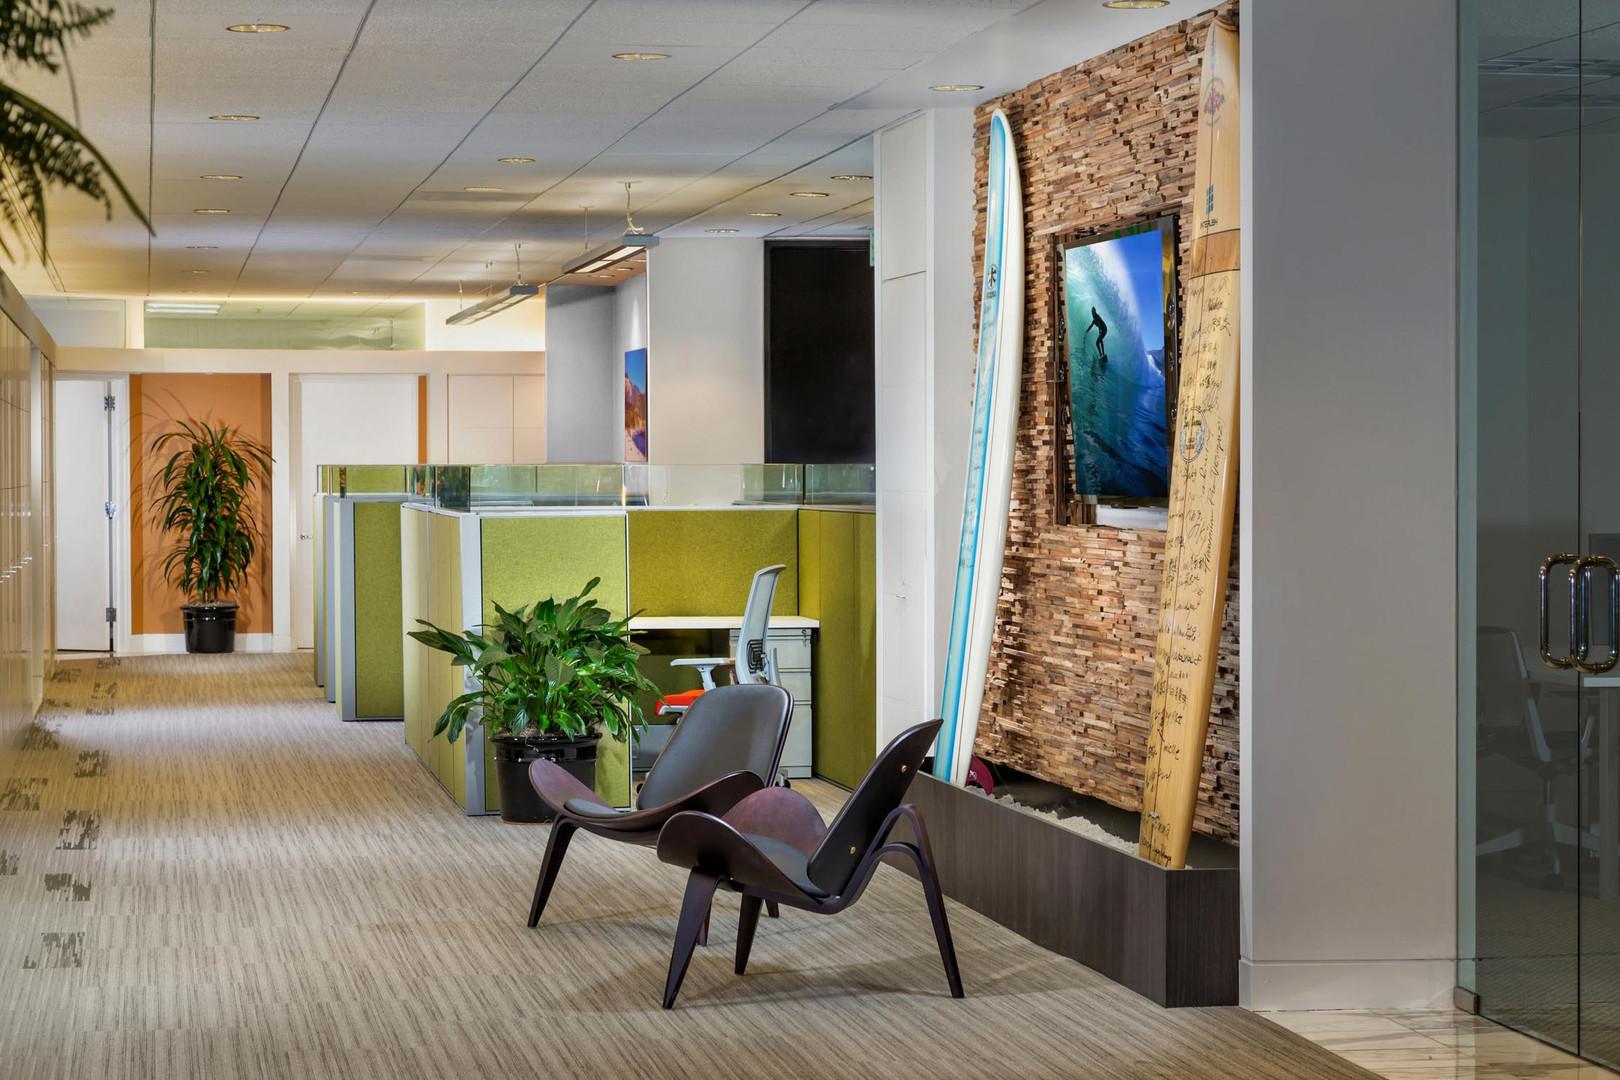 Interush Irvine Orange County hallway